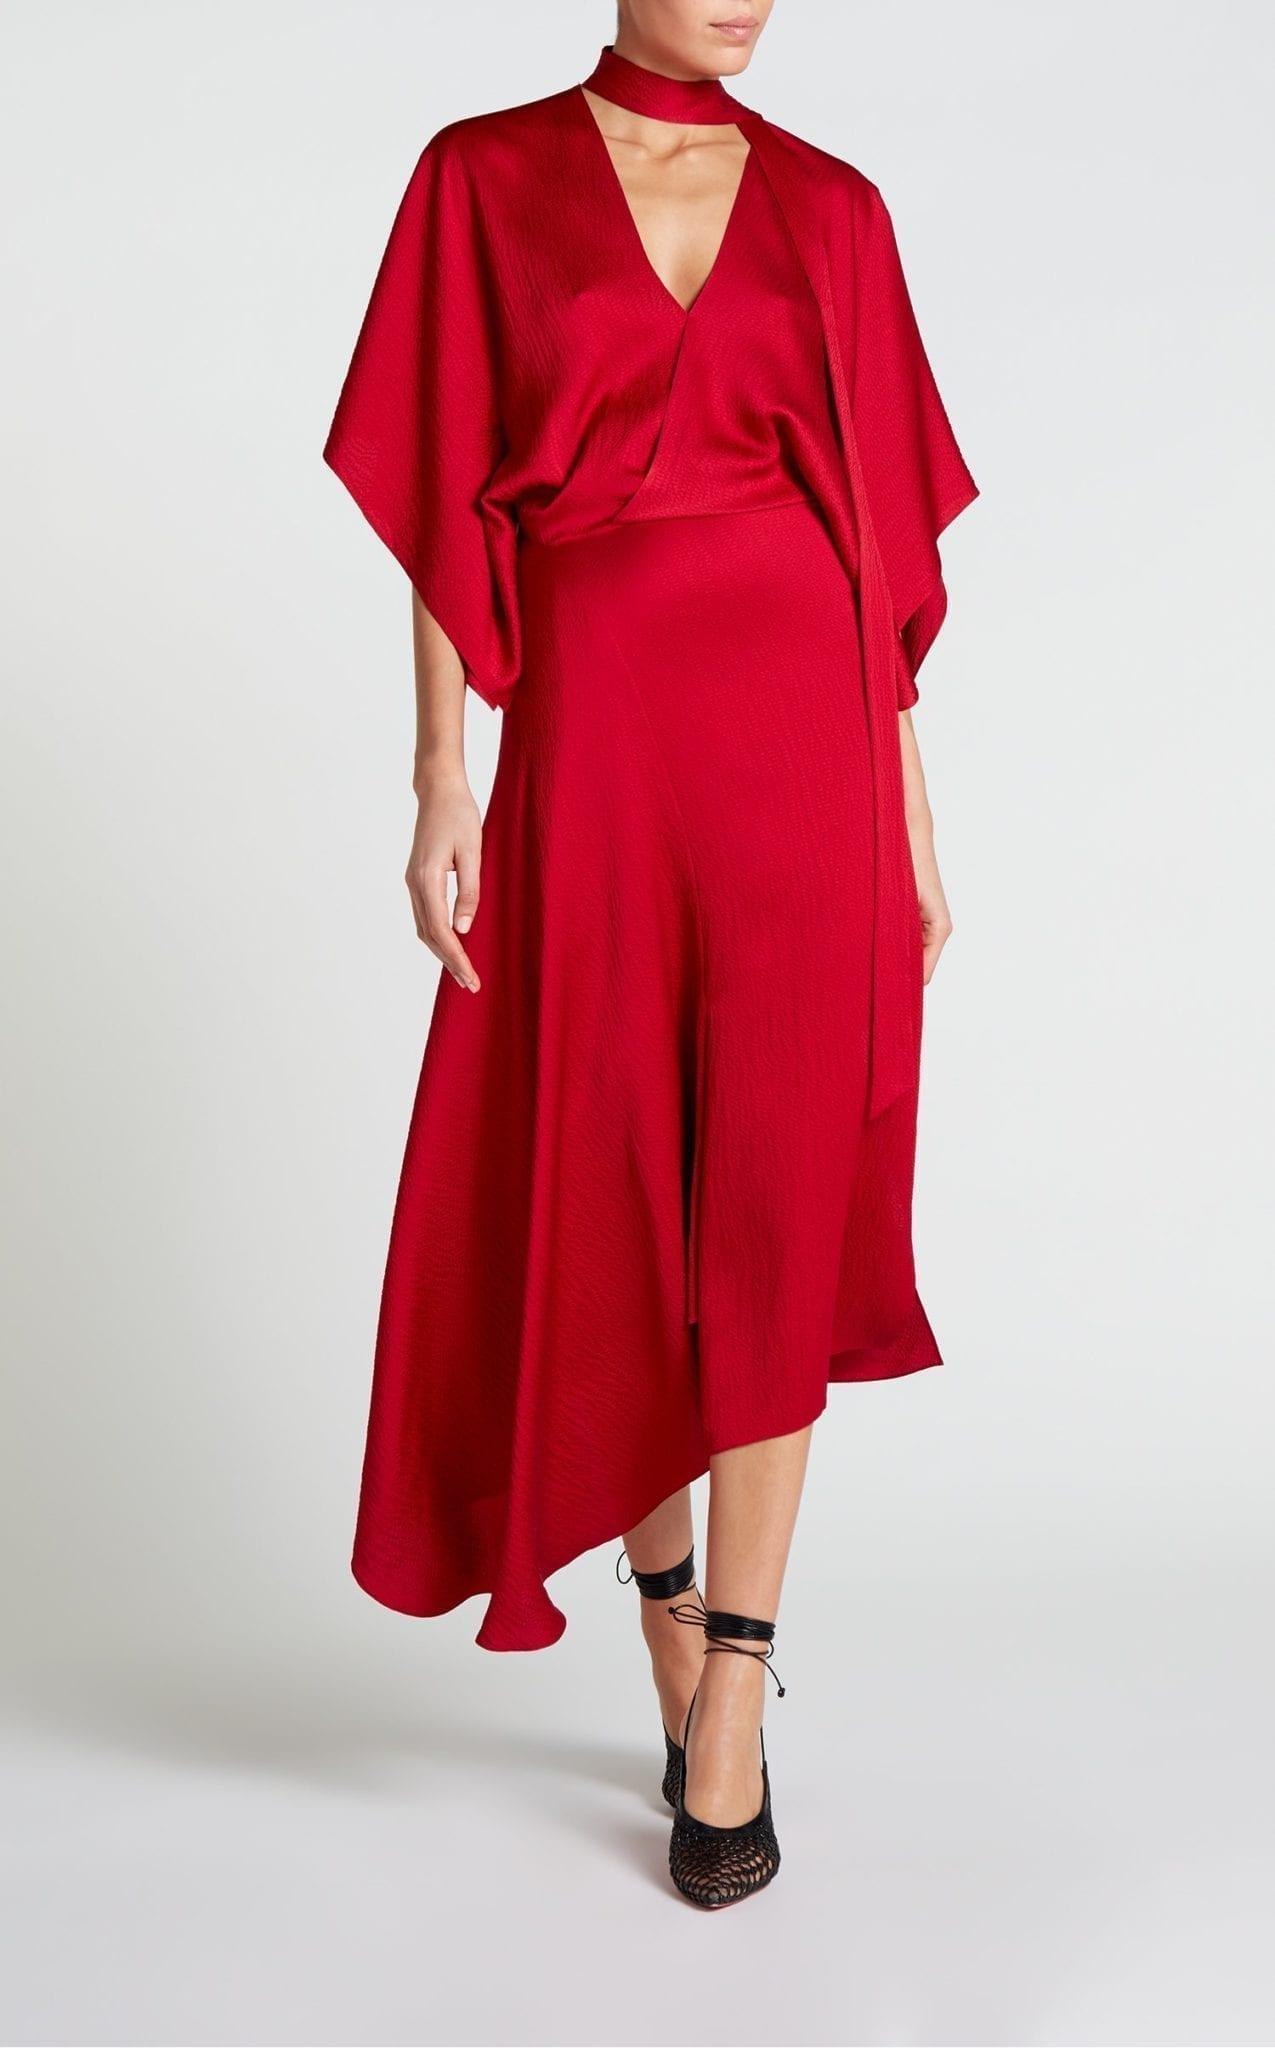 ROLAND MOURET Meyers Red Dress